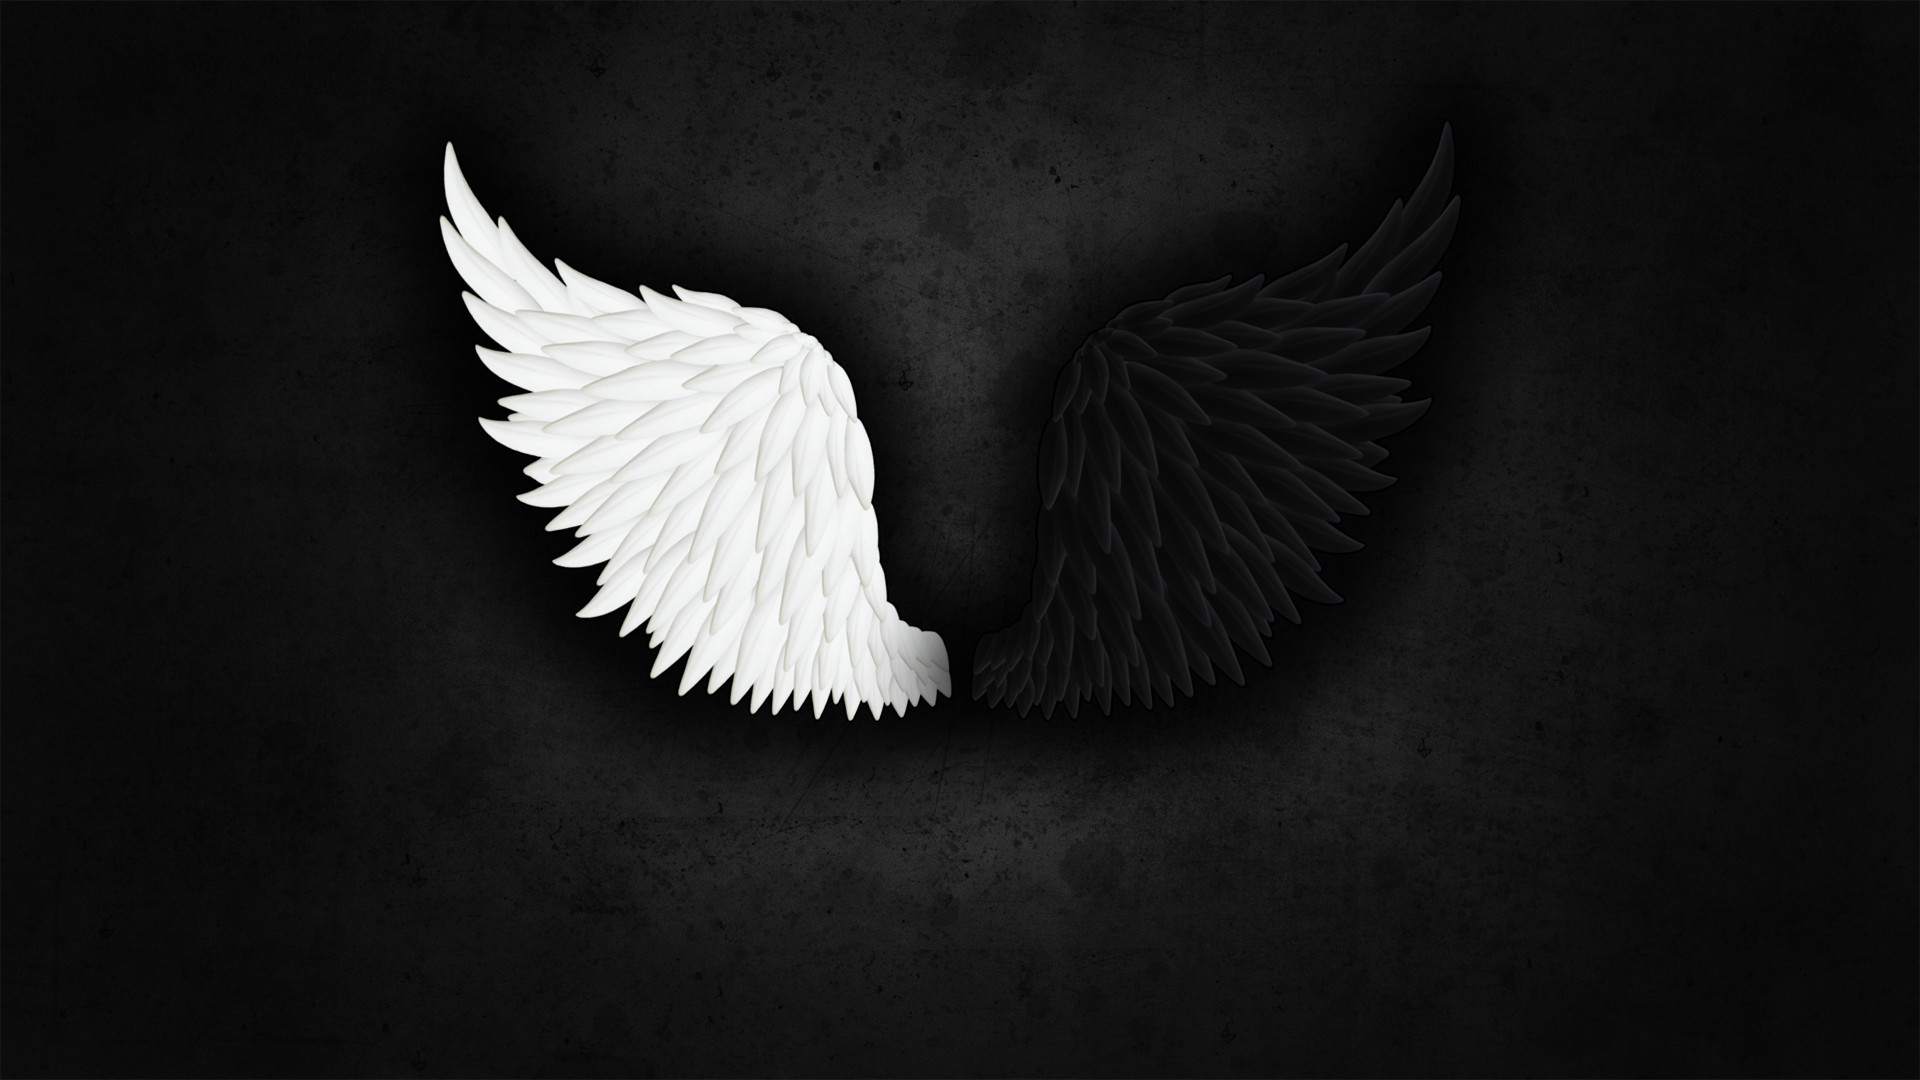 67 Angel Wings Wallpapers on WallpaperPlay 1920x1080